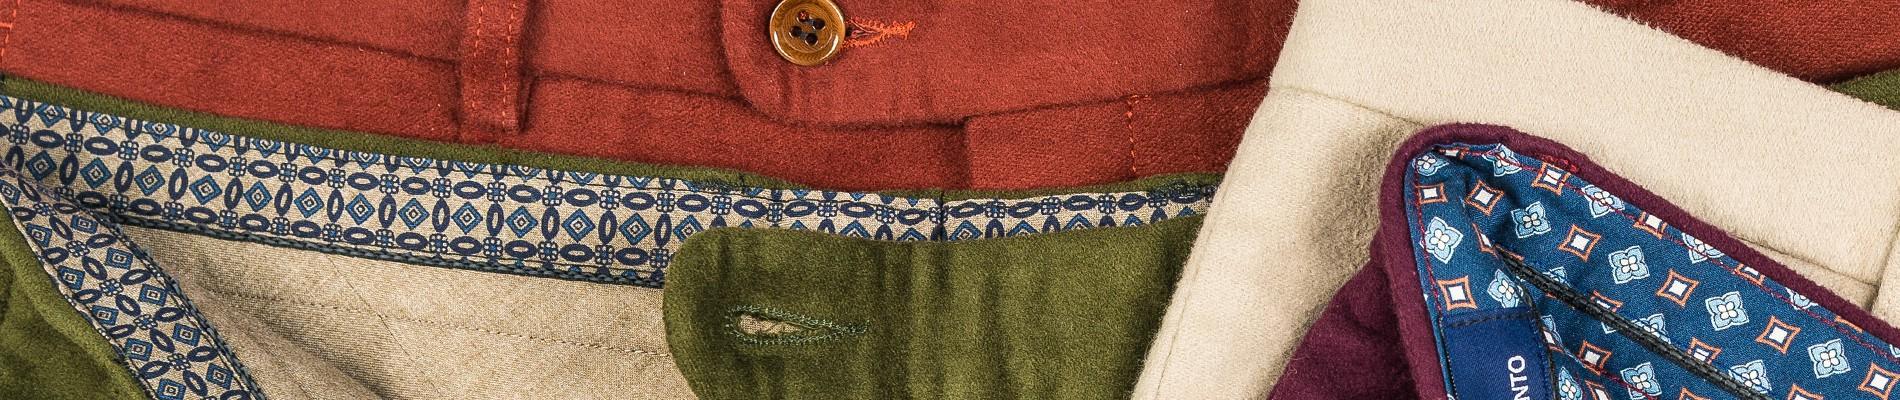 Spodnie moleskin | Benevento.pl